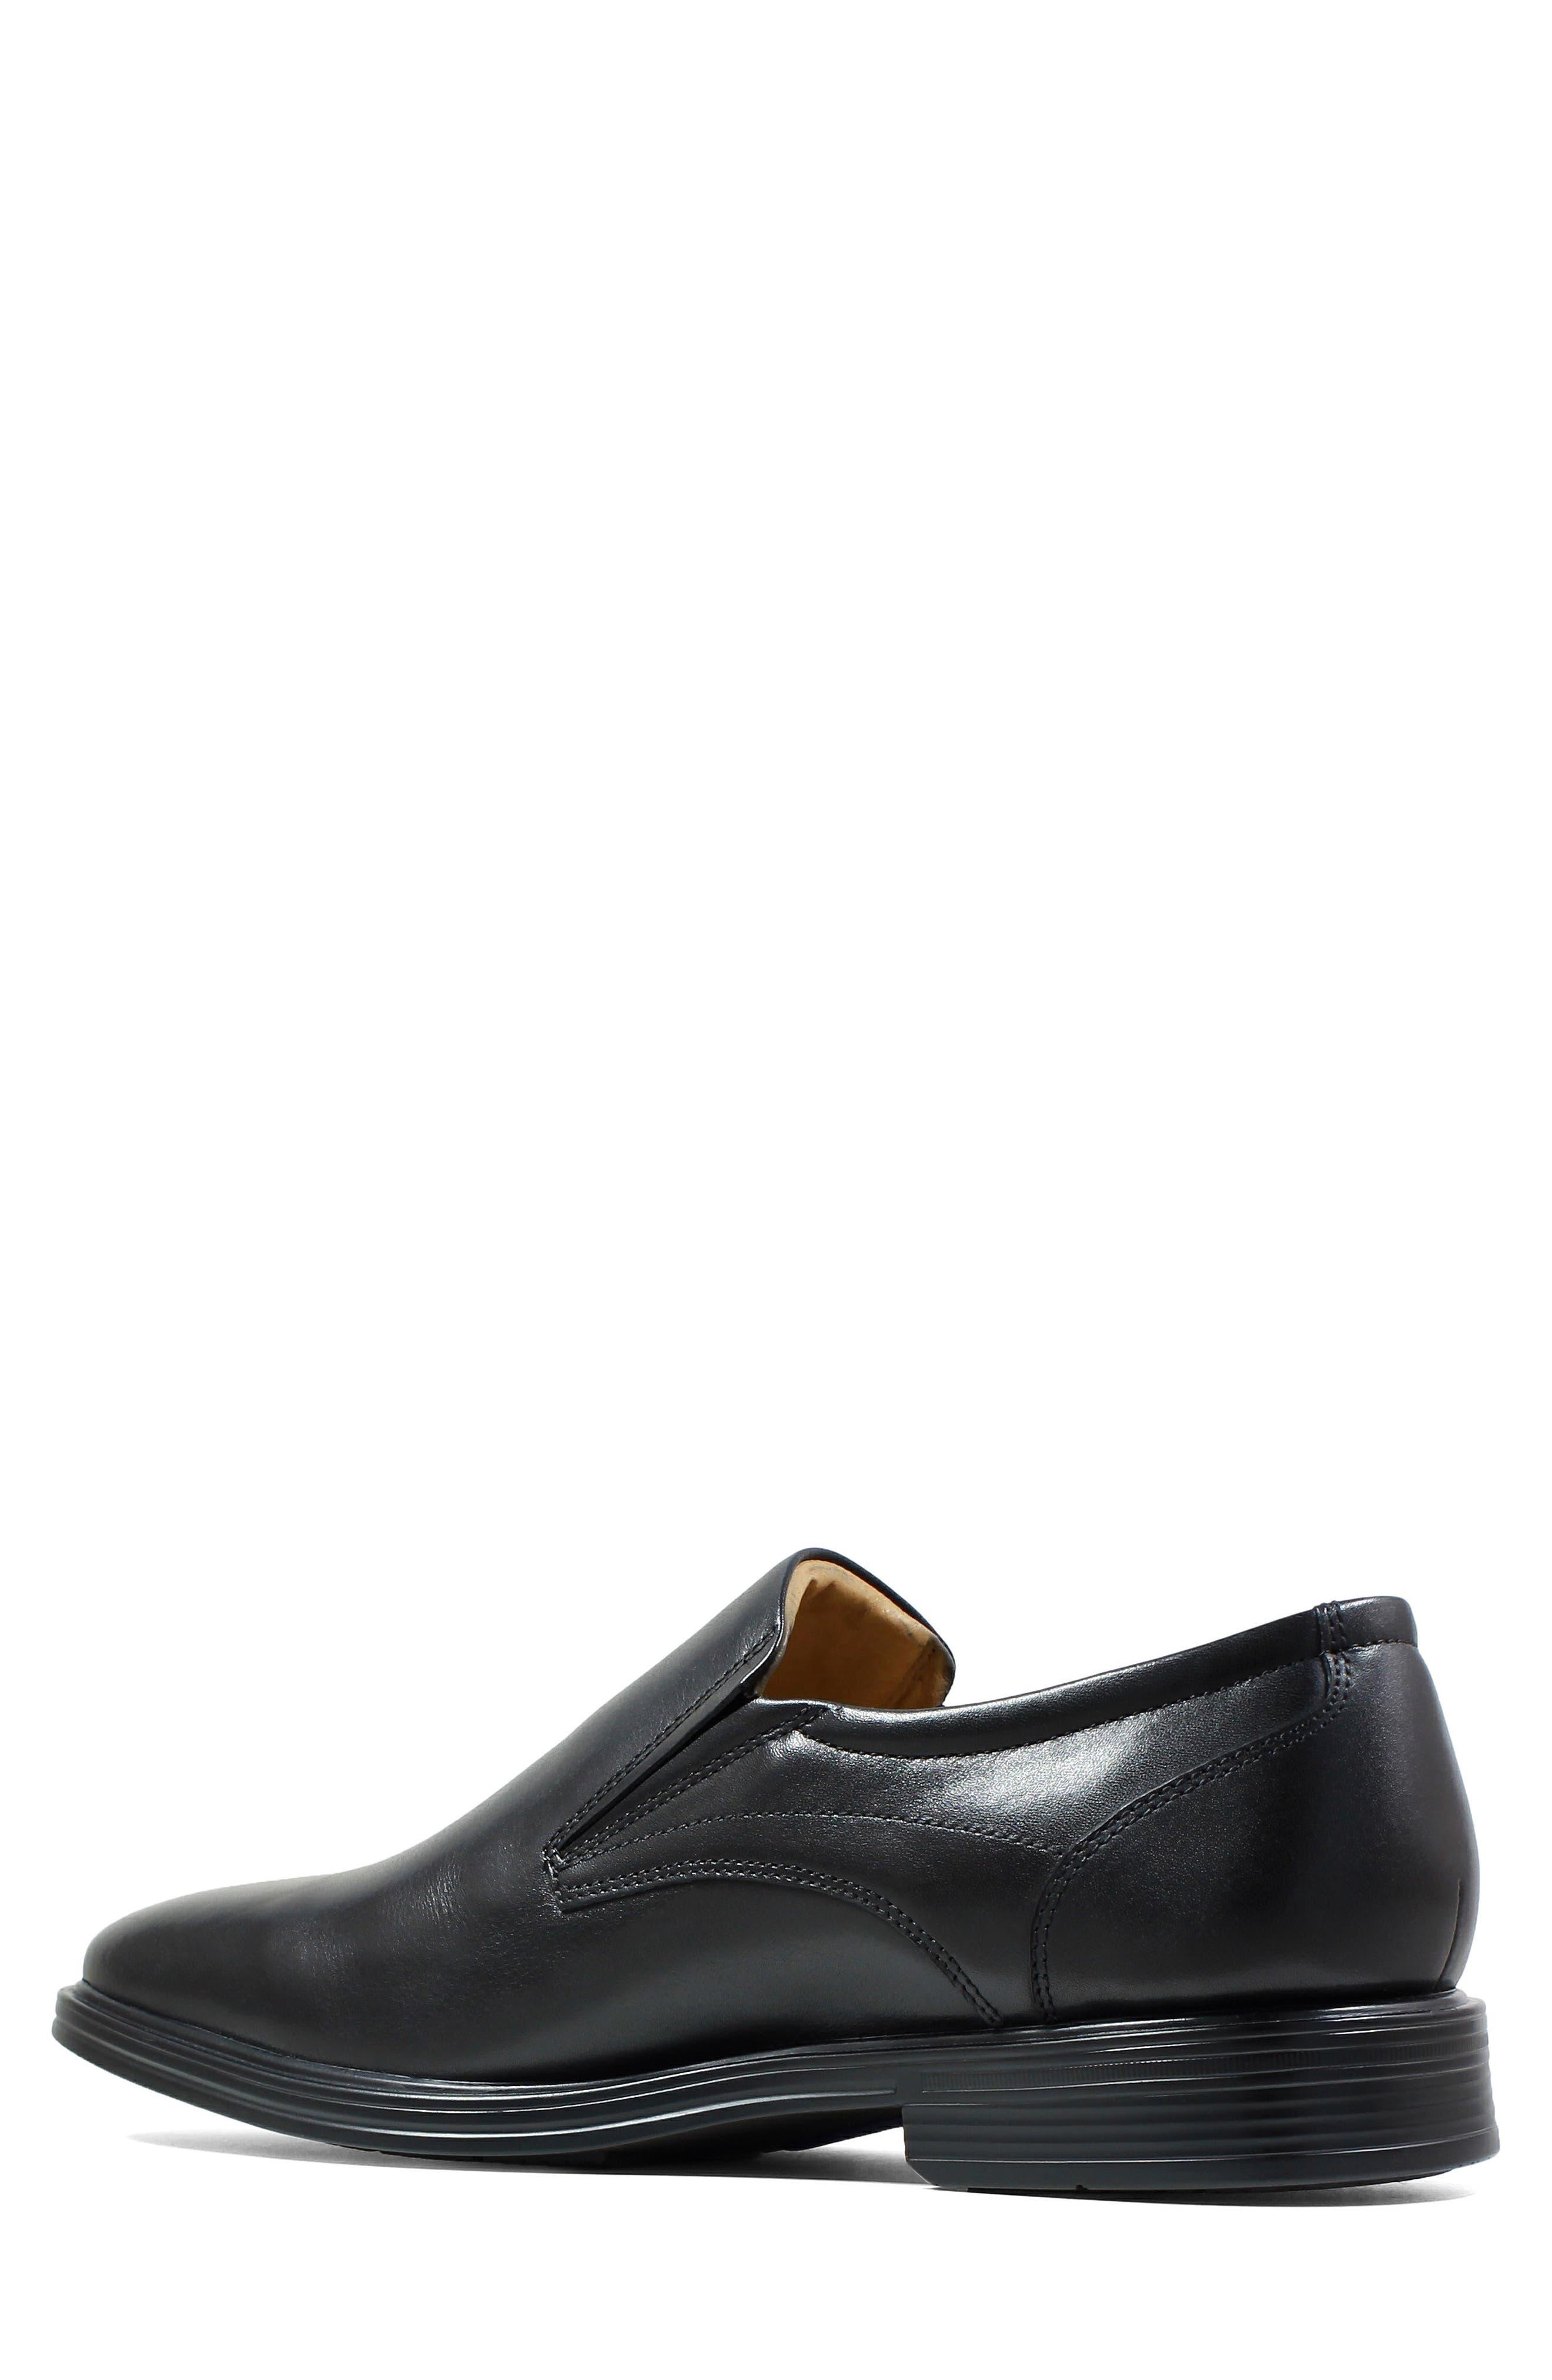 Heights Venetian Loafer,                             Alternate thumbnail 2, color,                             BLACK